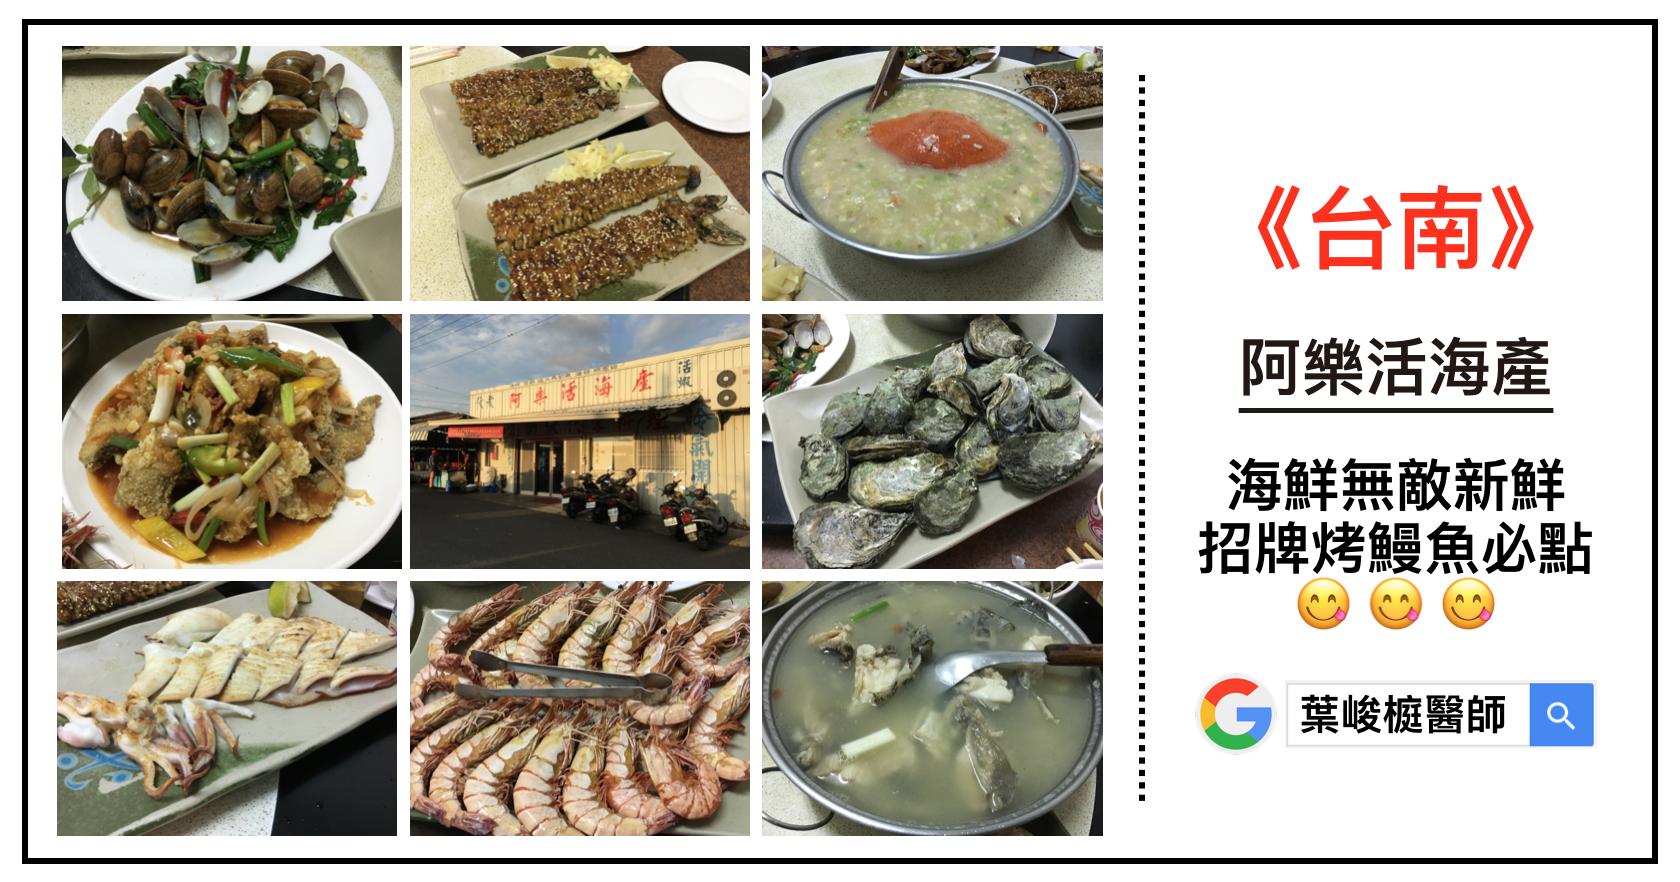 tainan seafood